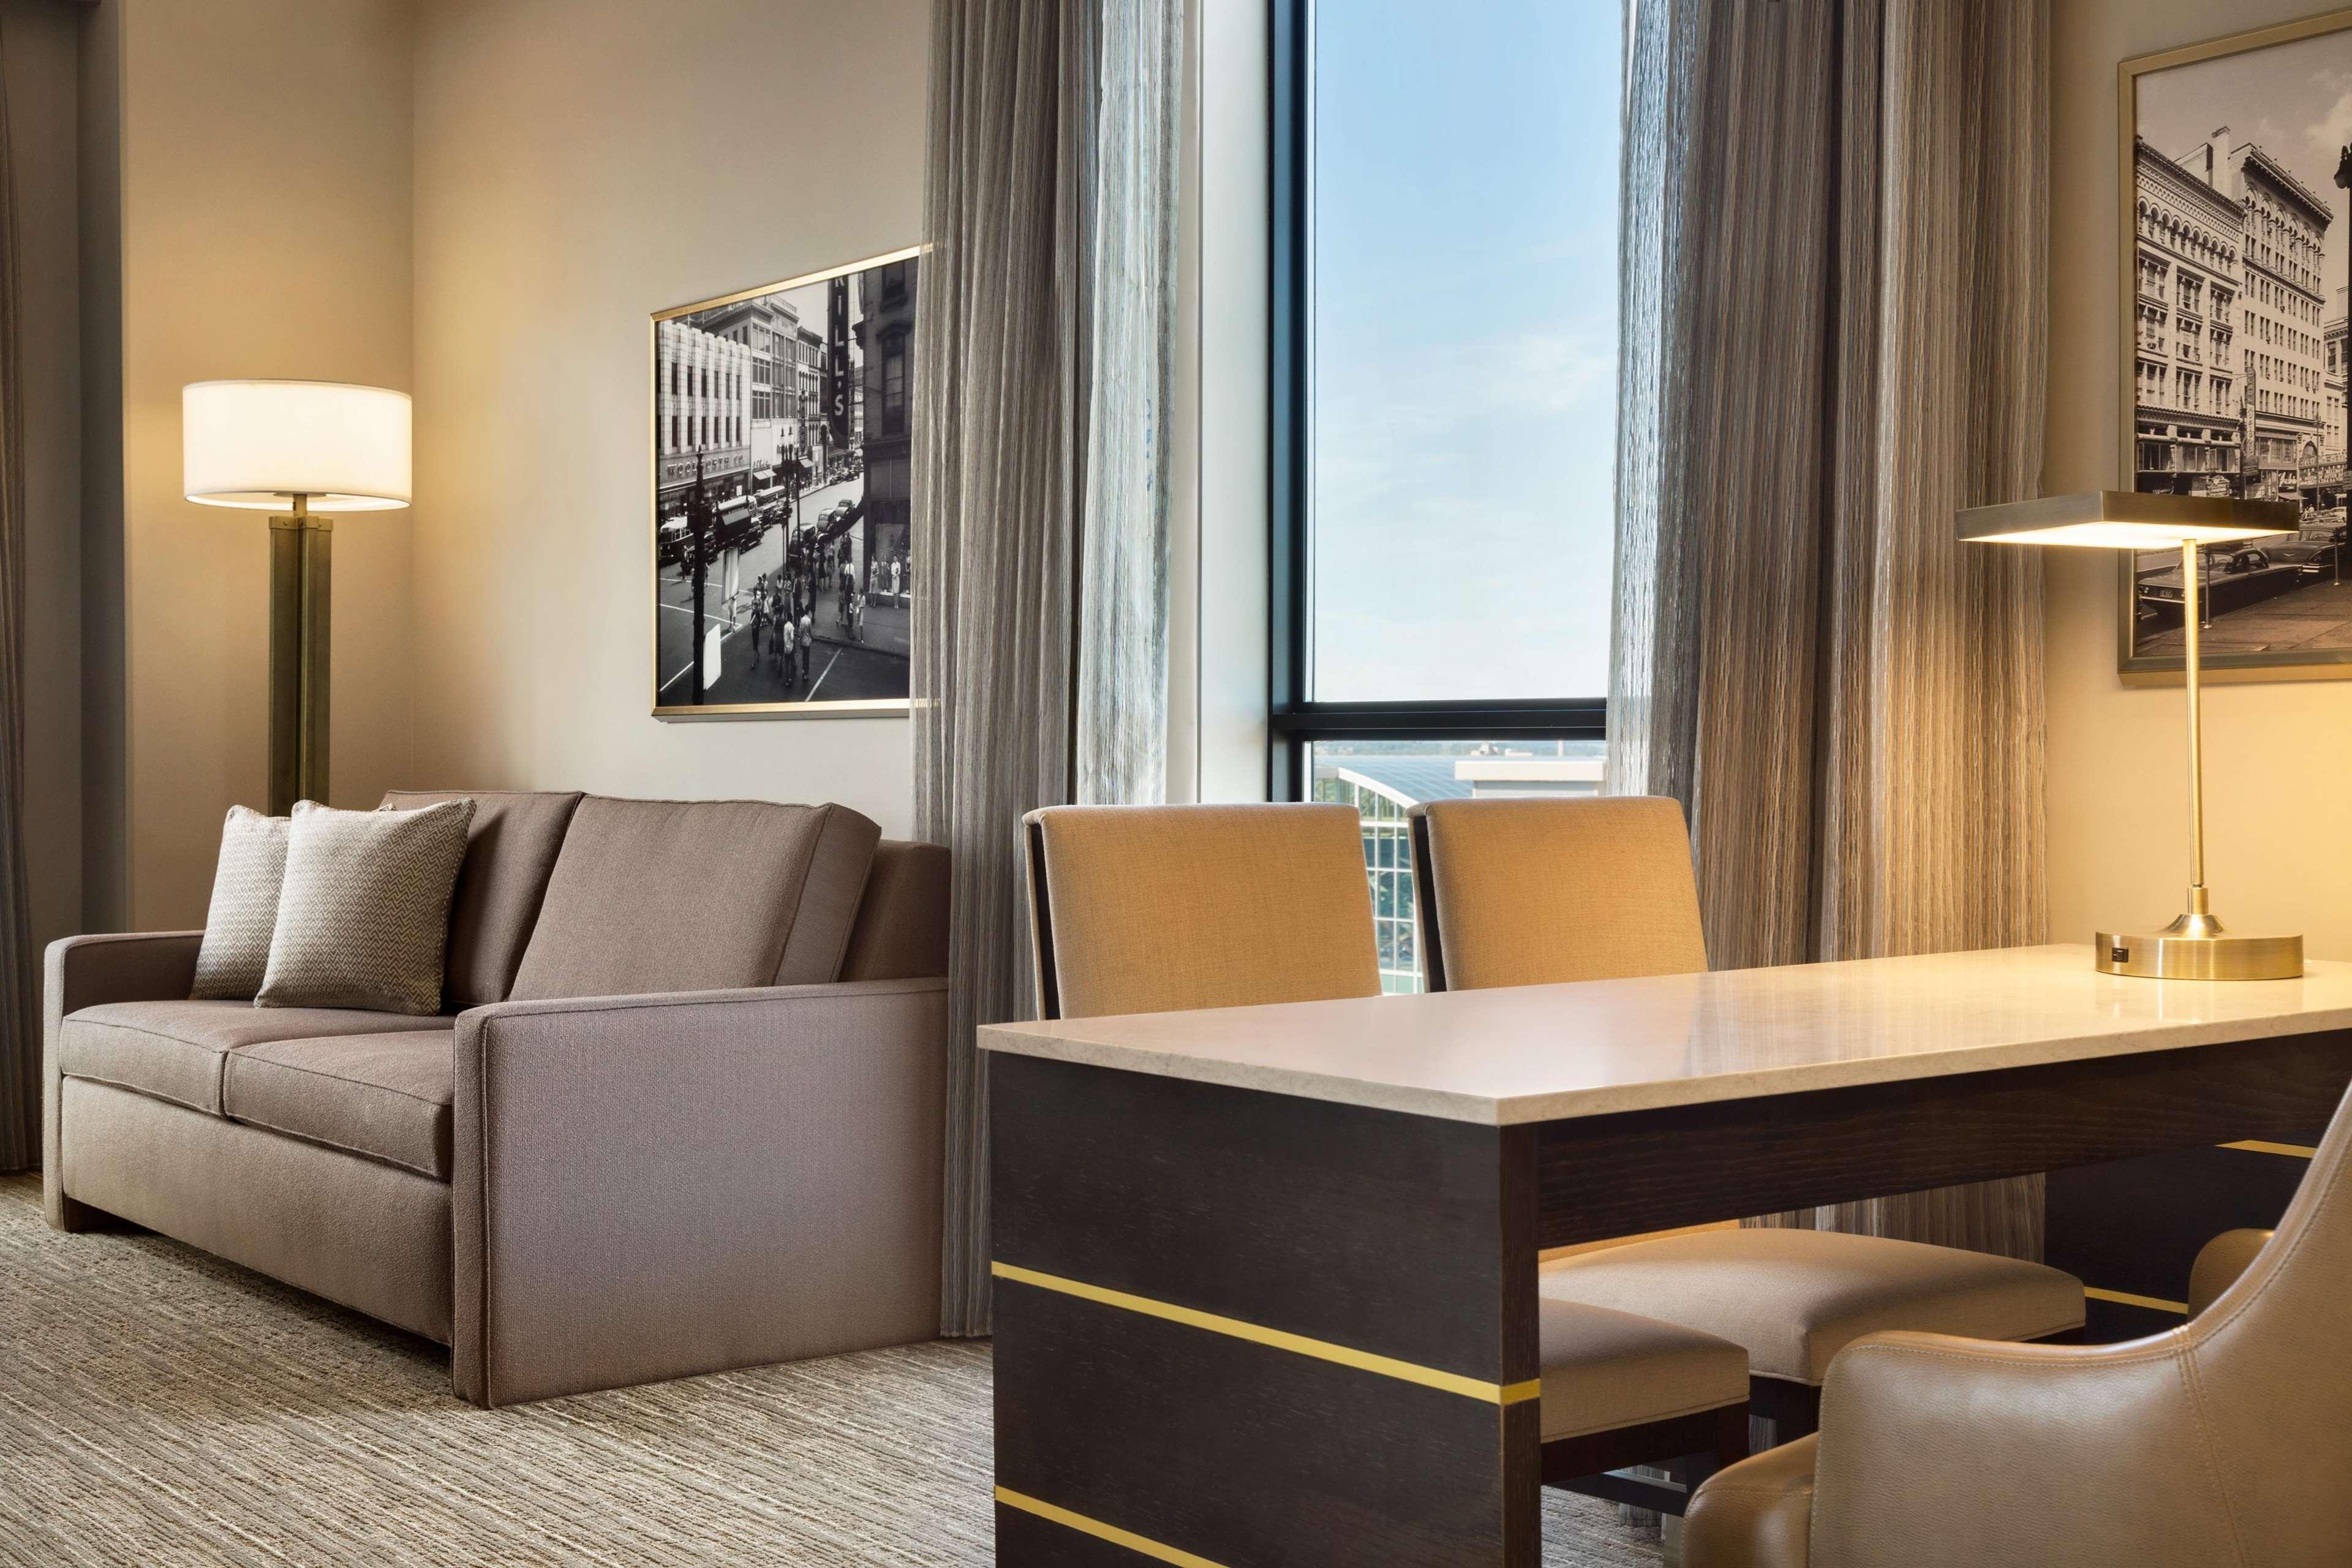 Embassy Suites by Hilton Syracuse Destiny USA image 15